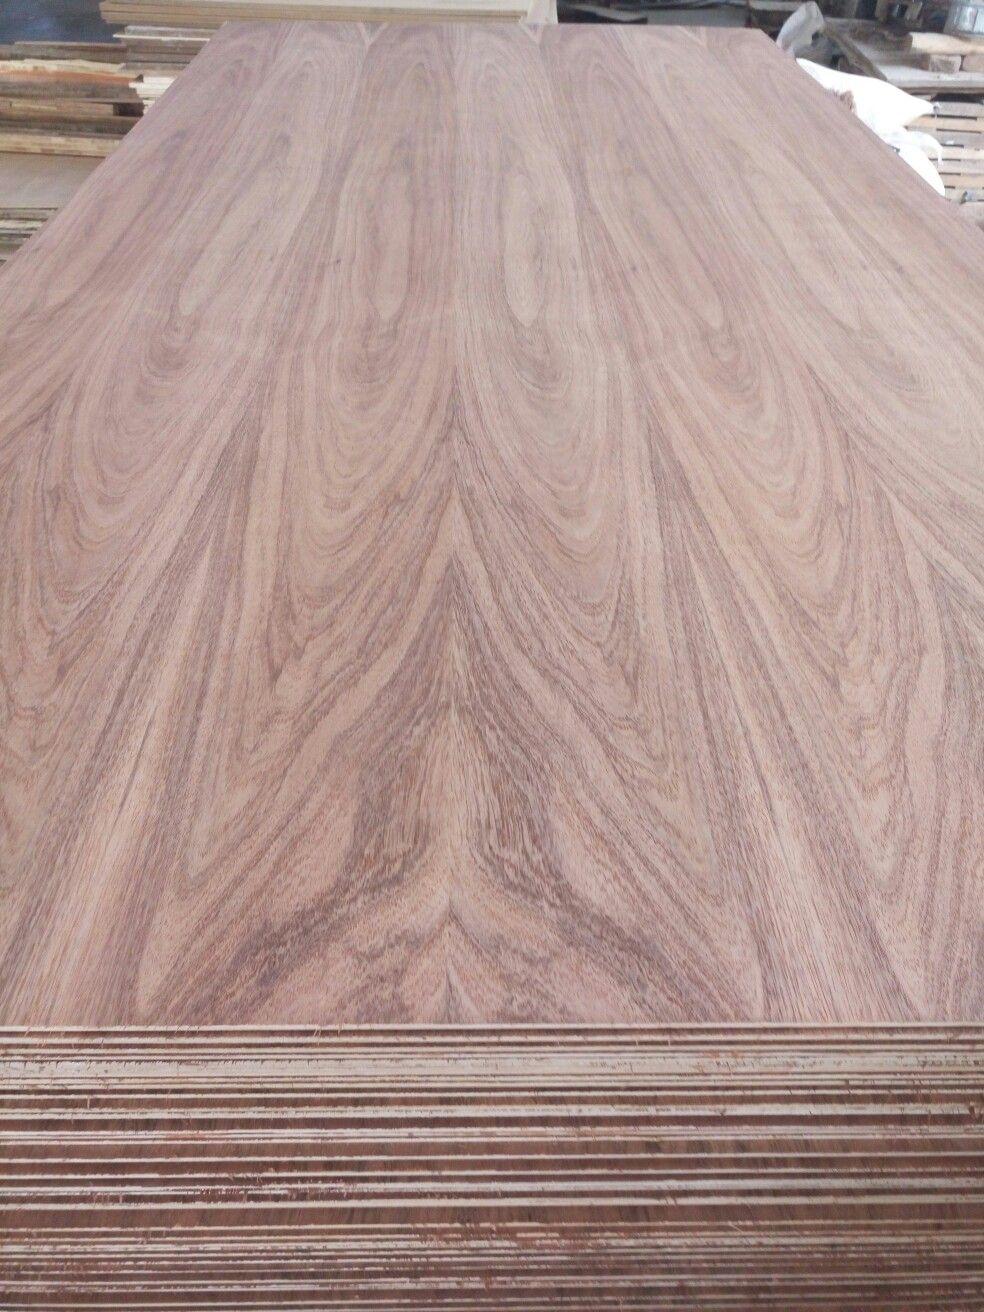 Mexico Tzalam Veneer Faced Plywood Tzalam Wood Veneer Hardwood Hardwood Floors